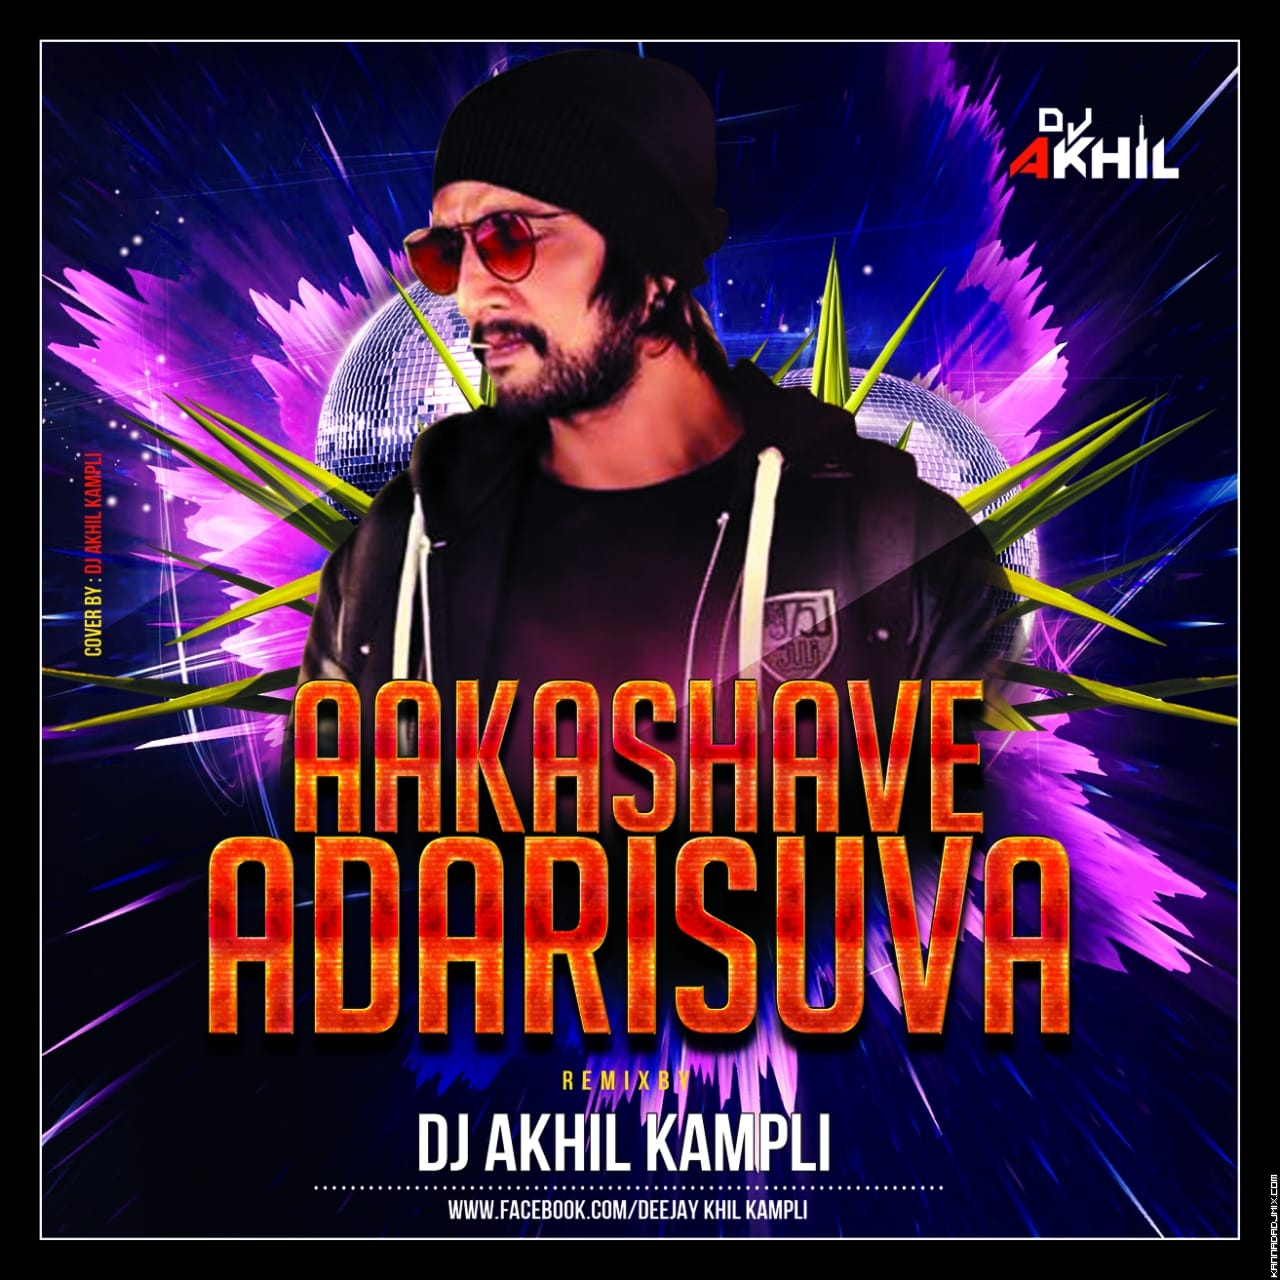 Aaakashane Adarisuva(Kotigobba 3) Drop Mix DJ AKHIL KMP.mp3